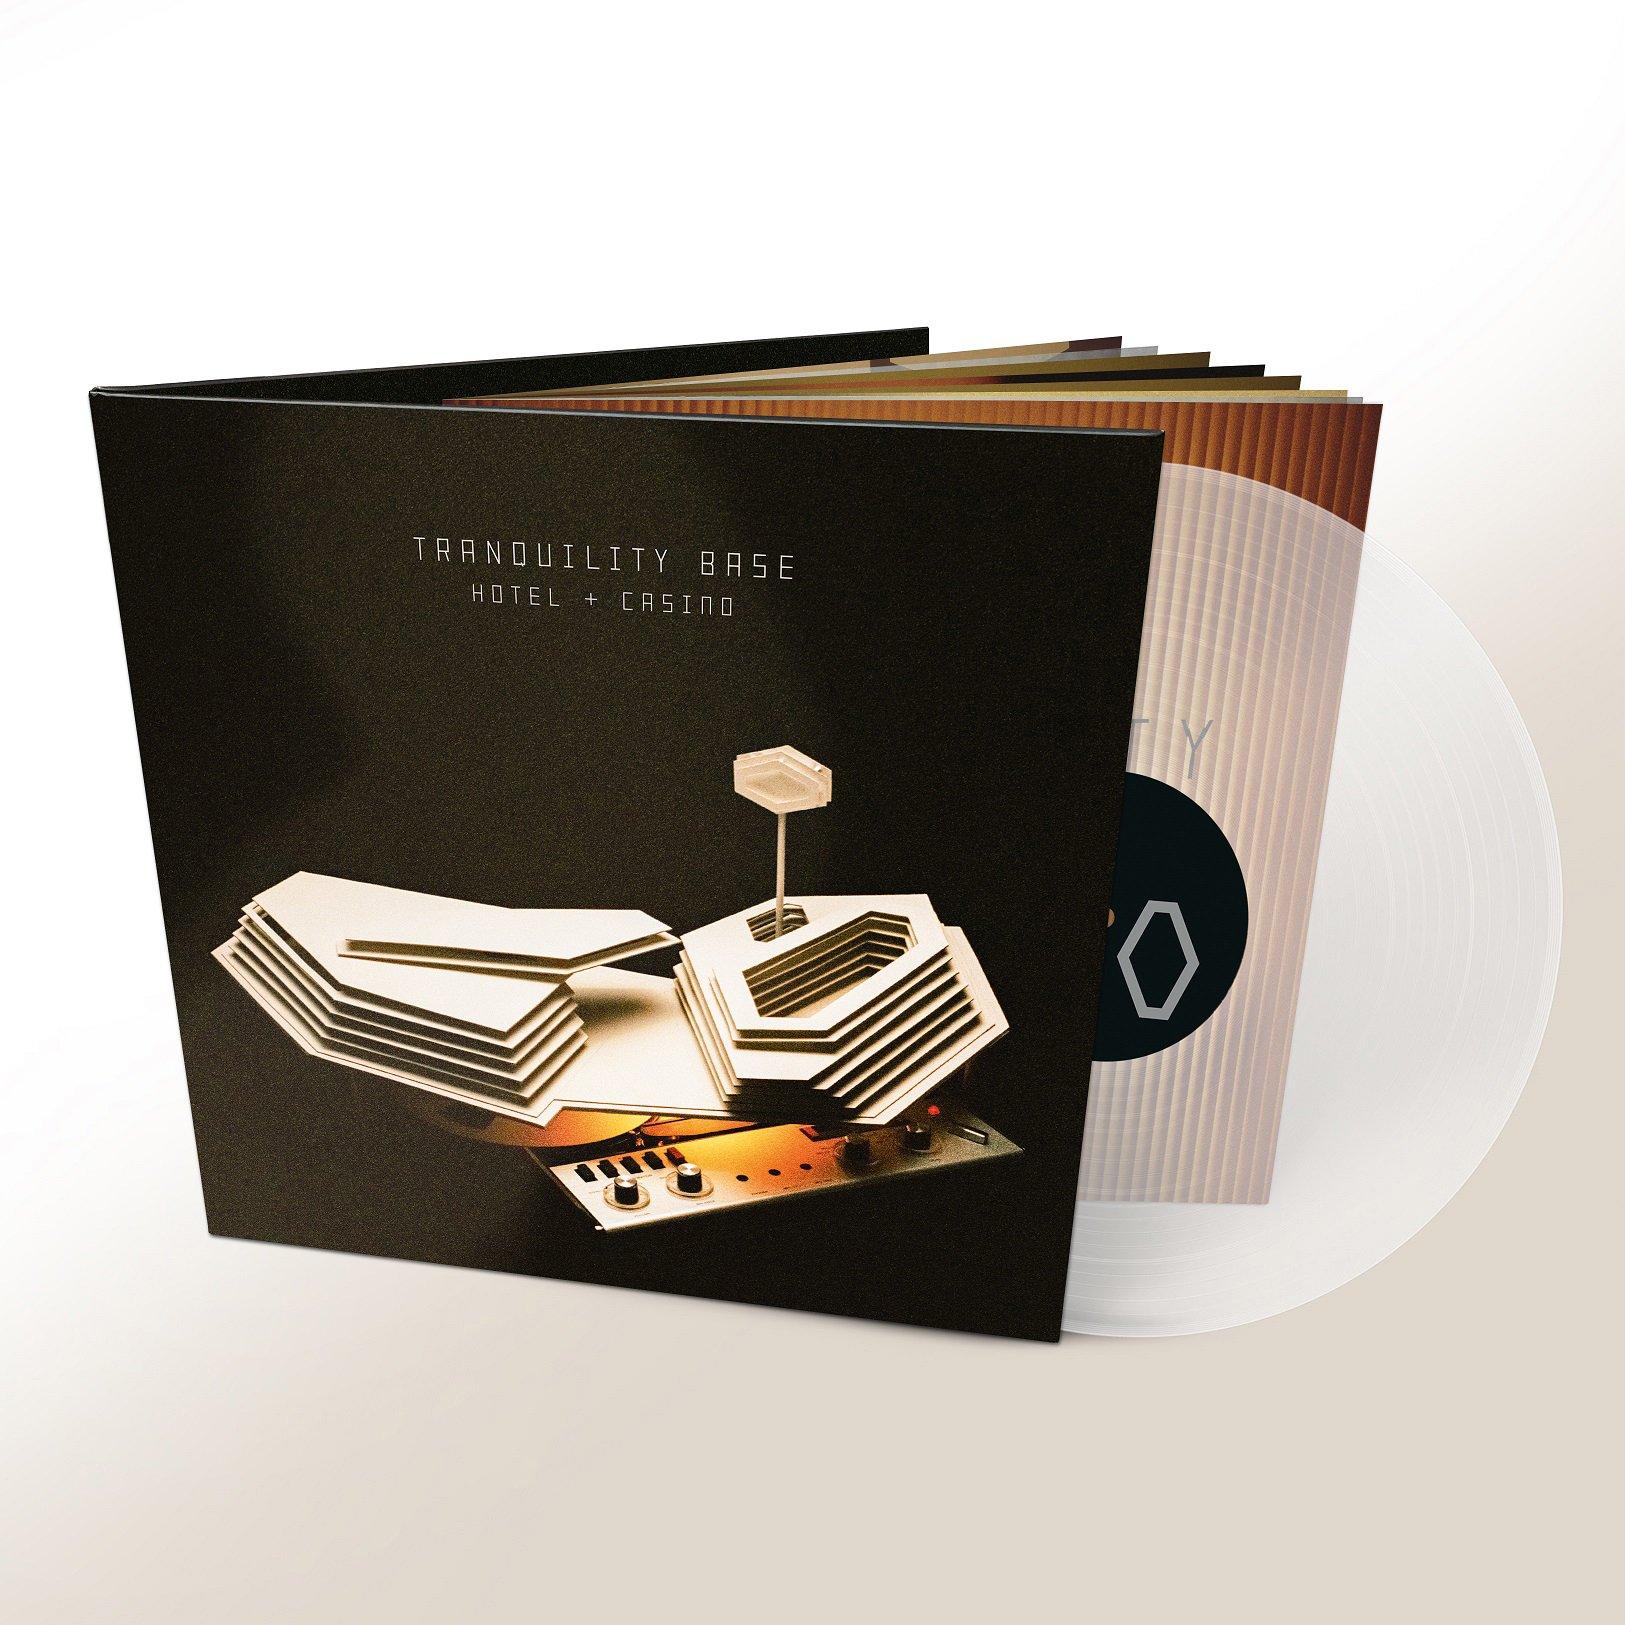 Vinilo : Arctic Monkeys - Tranquility Base Hotel & Casino (Clear Vinyl, 180 Gram Vinyl, Indie Exclusive, Digital Download Card)